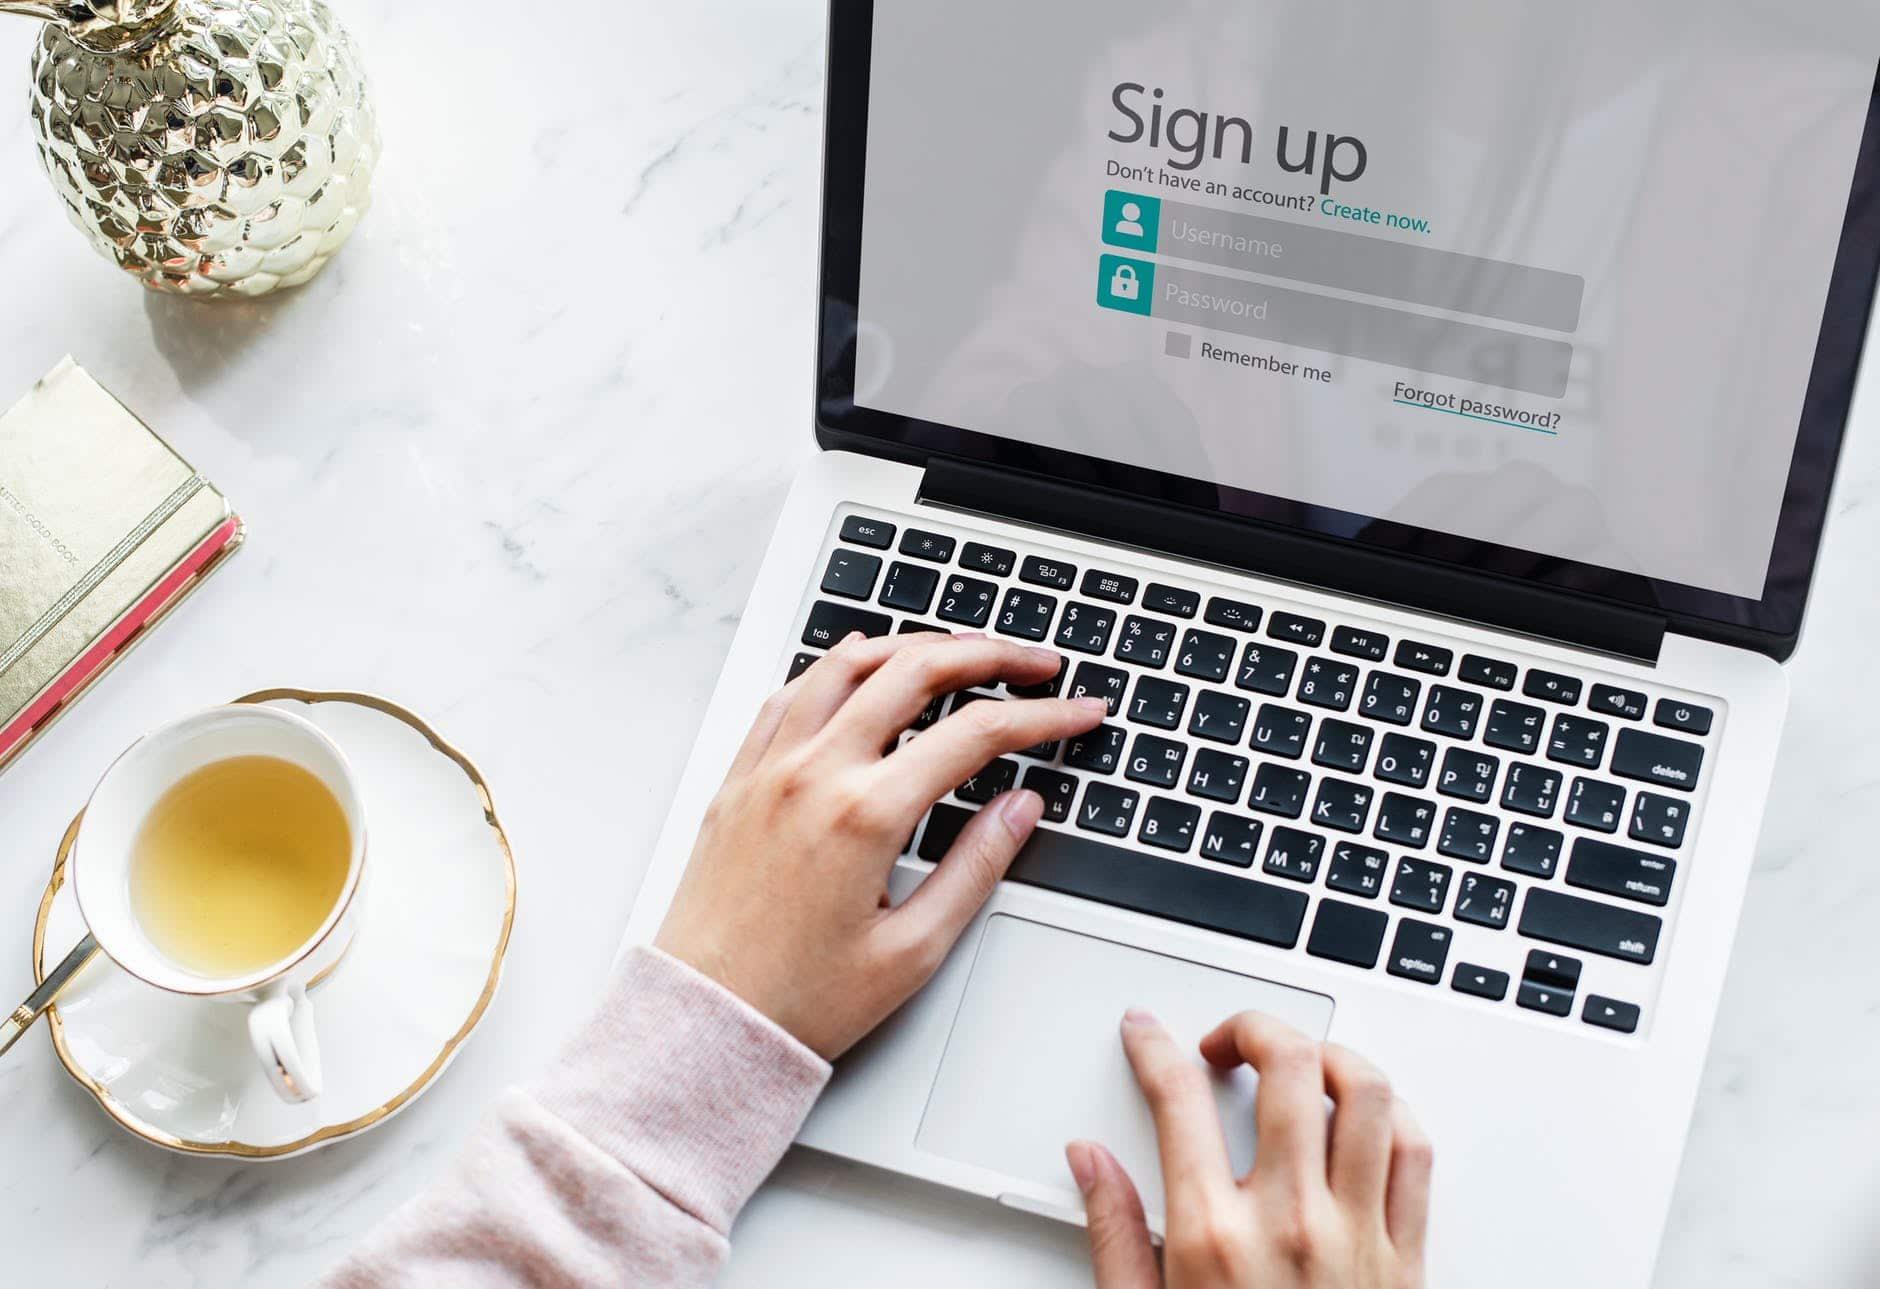 instaling plugins on website, Things to Consider Before Installing Plugins on Your Website